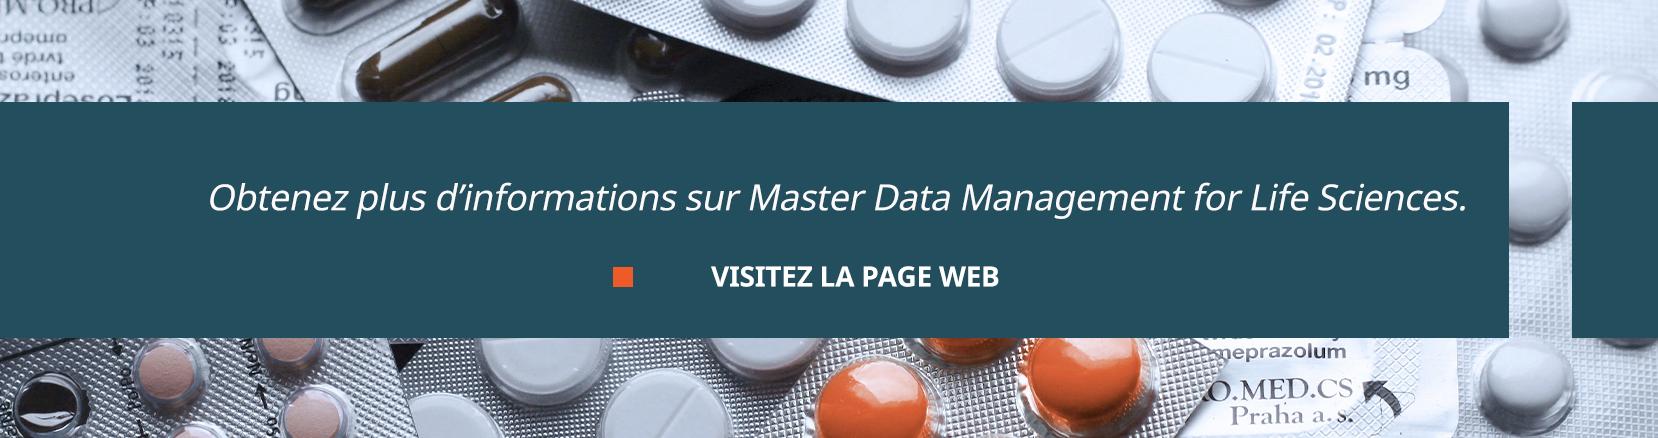 master data management for life sciences